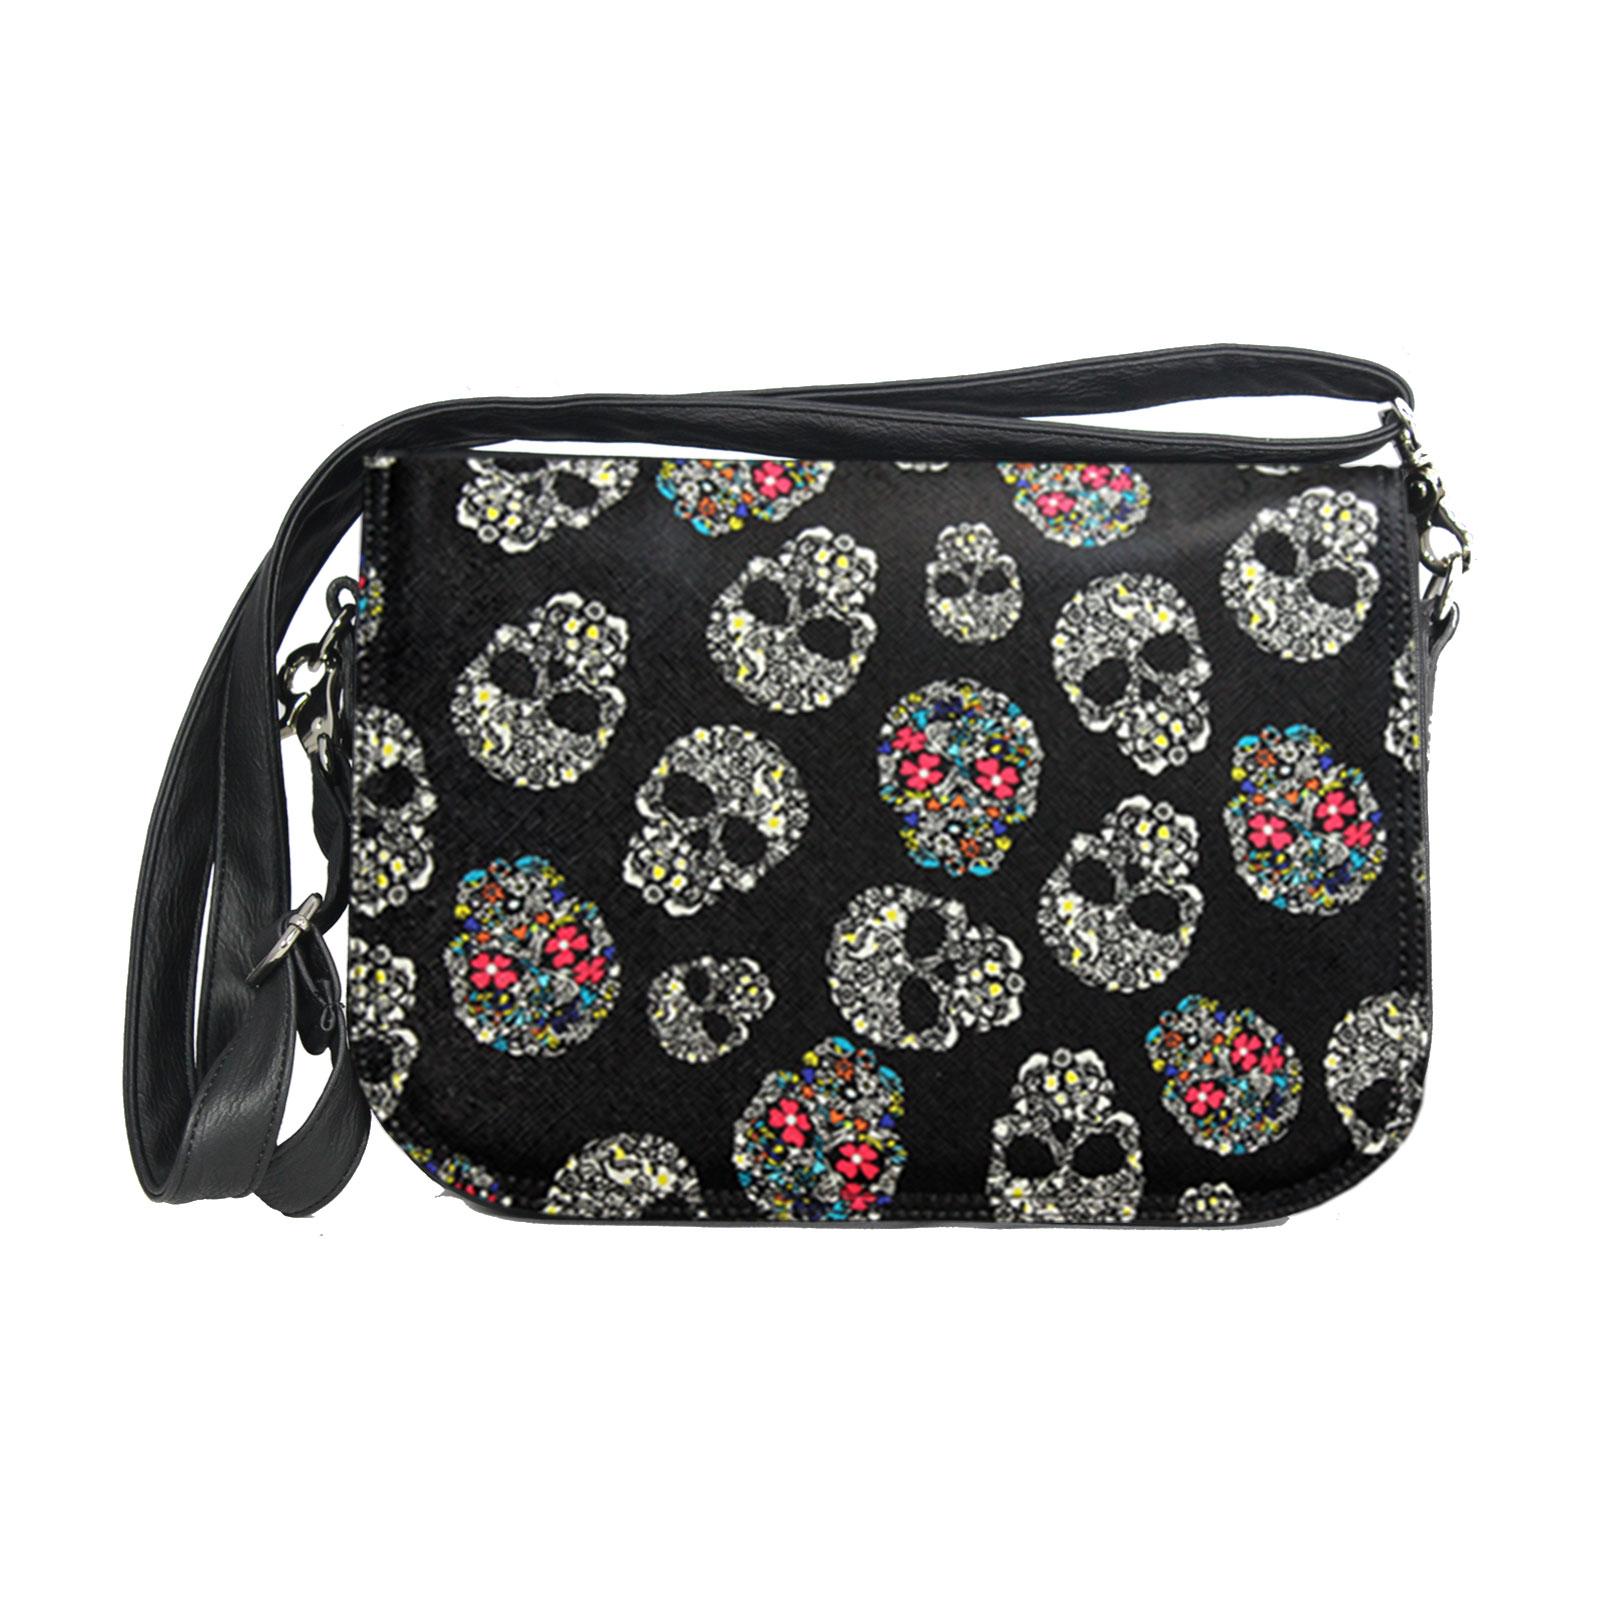 Damenhandtasche mit Totenkopfdesign Delieta soft